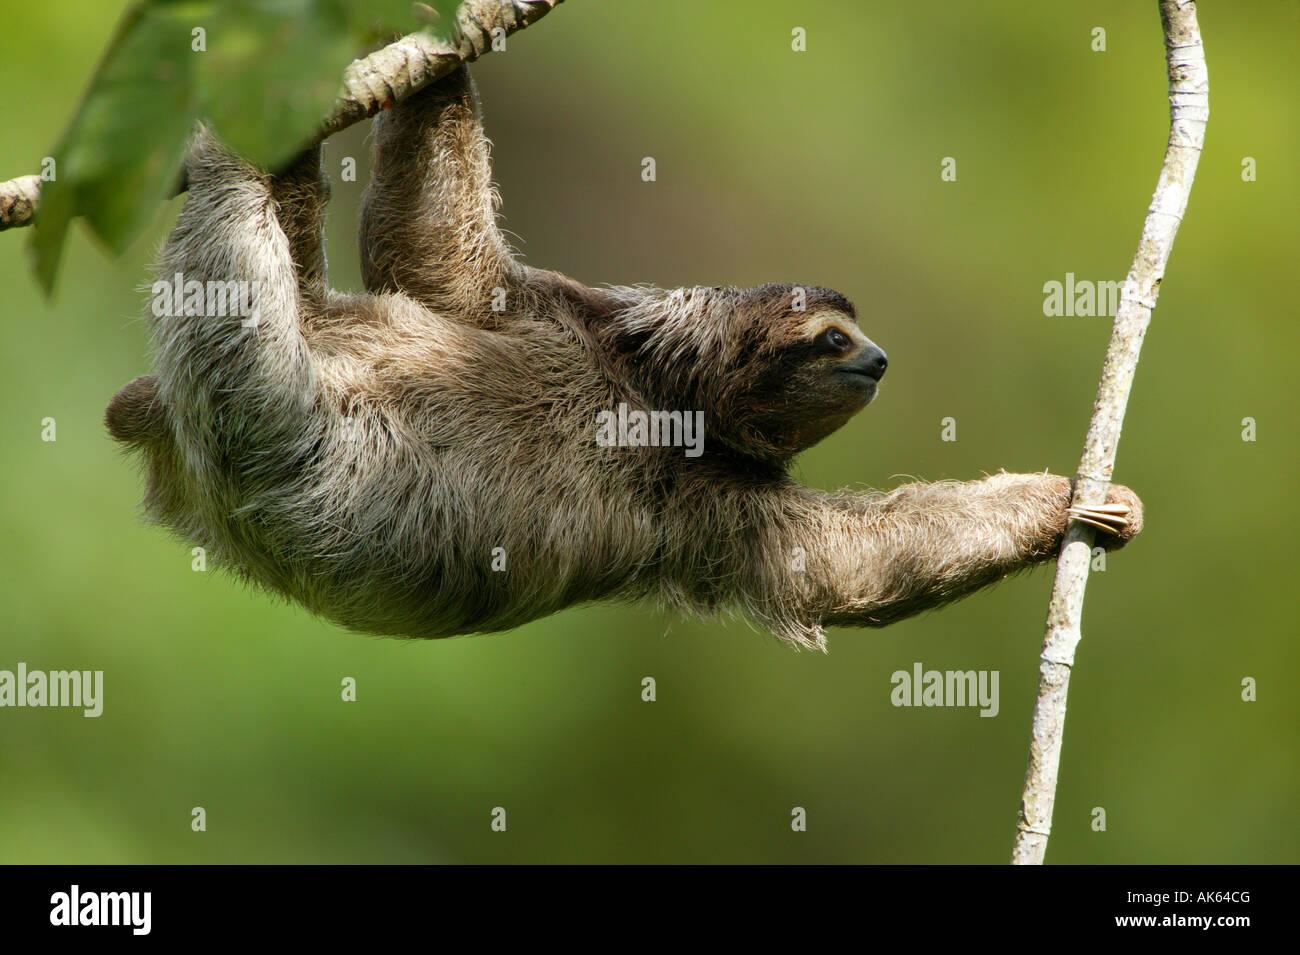 Drei-toed Sloth, Bradypus variegatus, in der 265 Hektar Regenwald Metropolitan Park, Panama City, Republik Panama. Stockbild